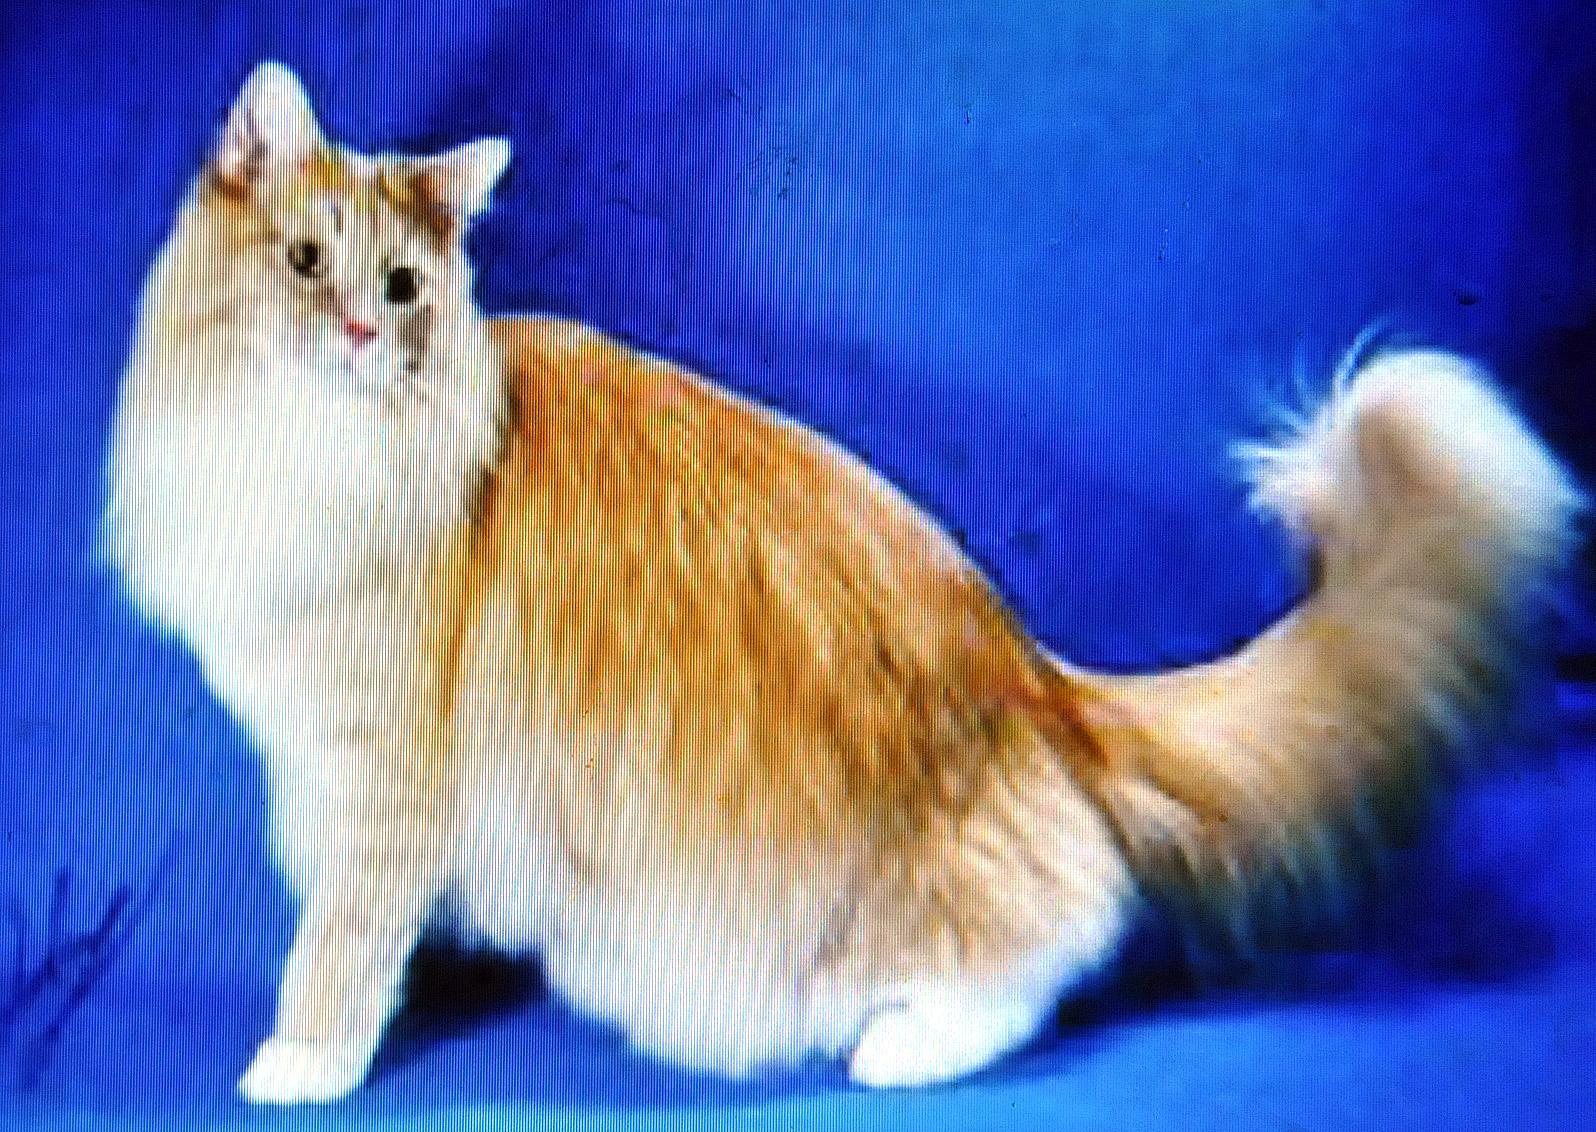 Gambar Kucing Yang Bagus godean.web.id